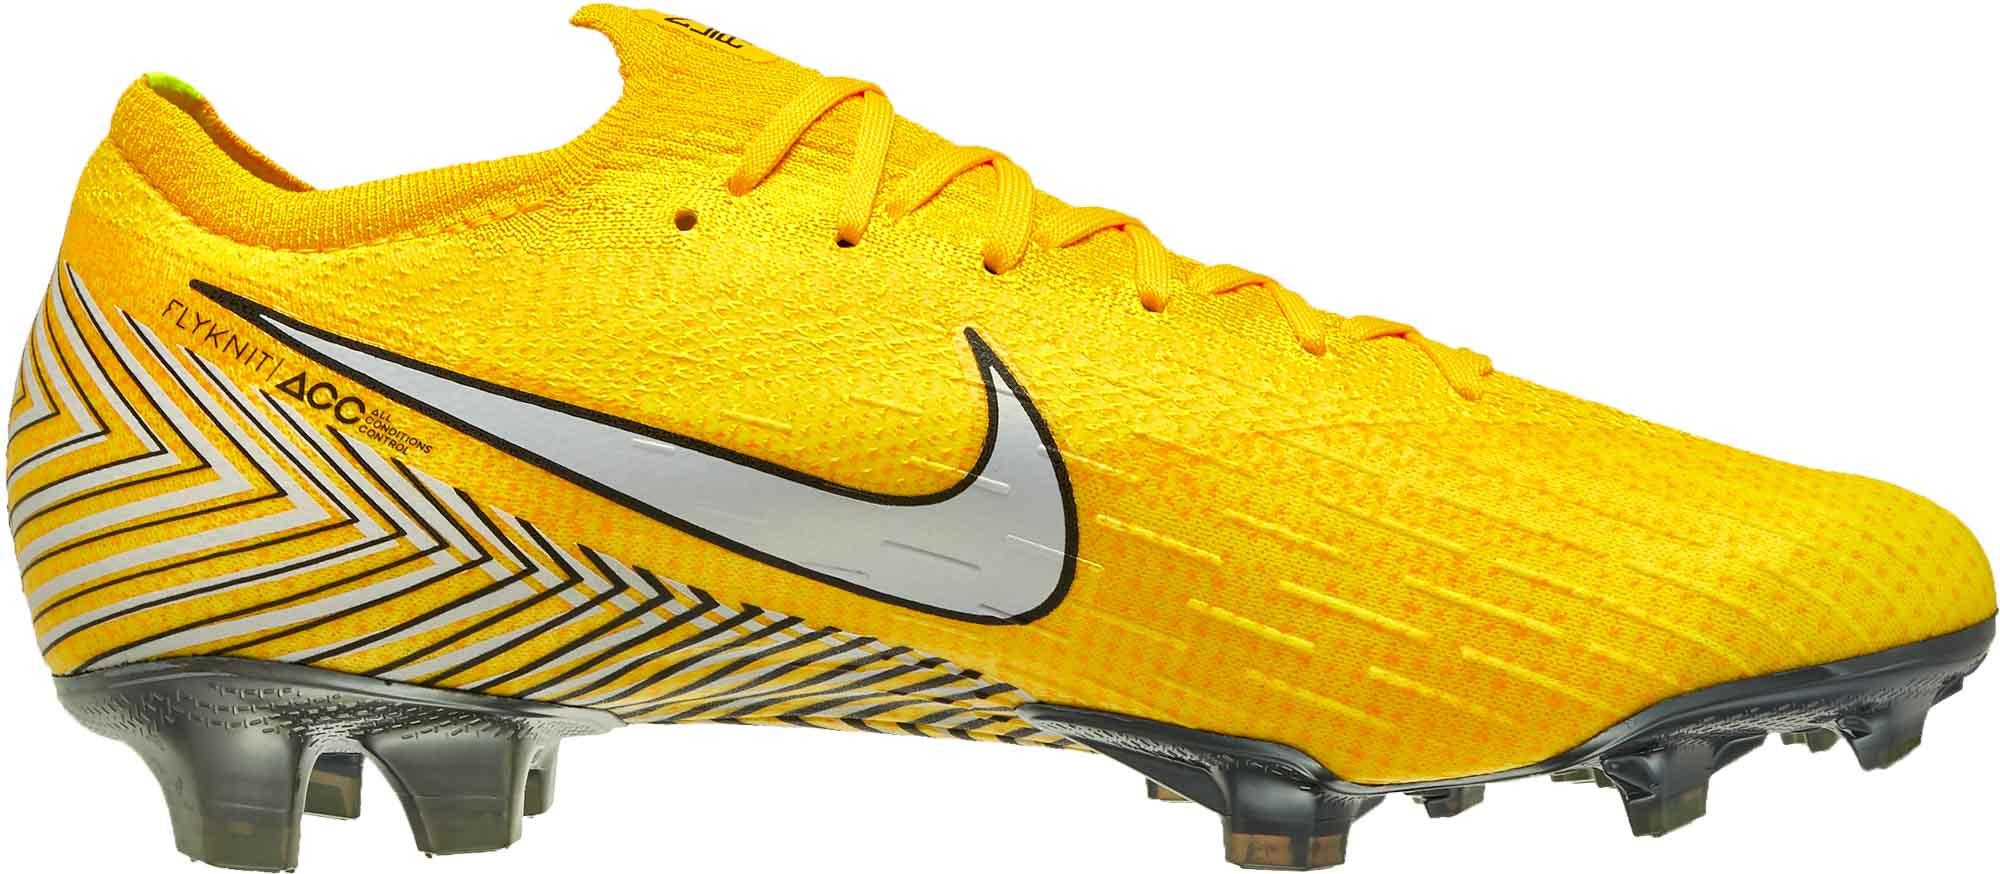 4935dd2636c Nike Neymar Vapor 12 Elite FG - Amarillo White Black - SoccerPro